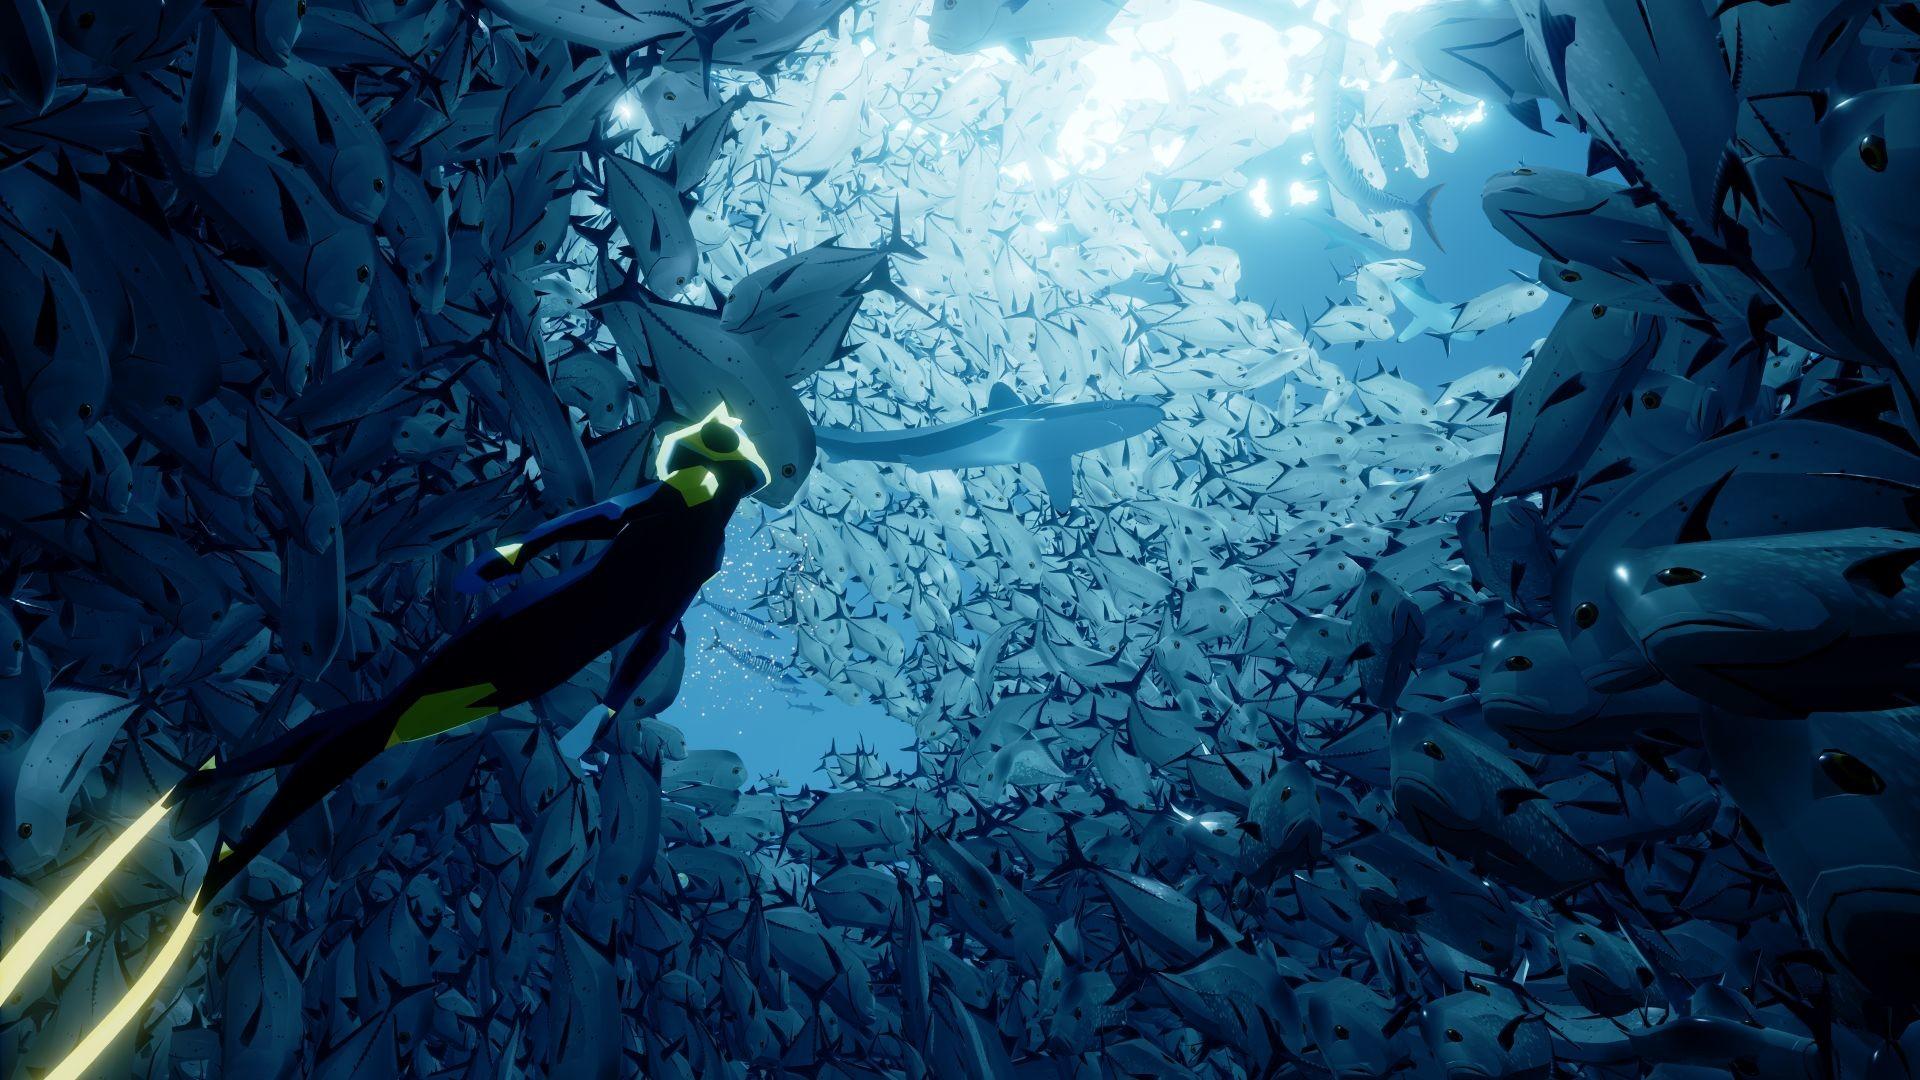 Abzu Gamescom 2016 Underwater Best Games Pc Ps4 Xbox One Game Of Thrones  Iphone Wallpaper